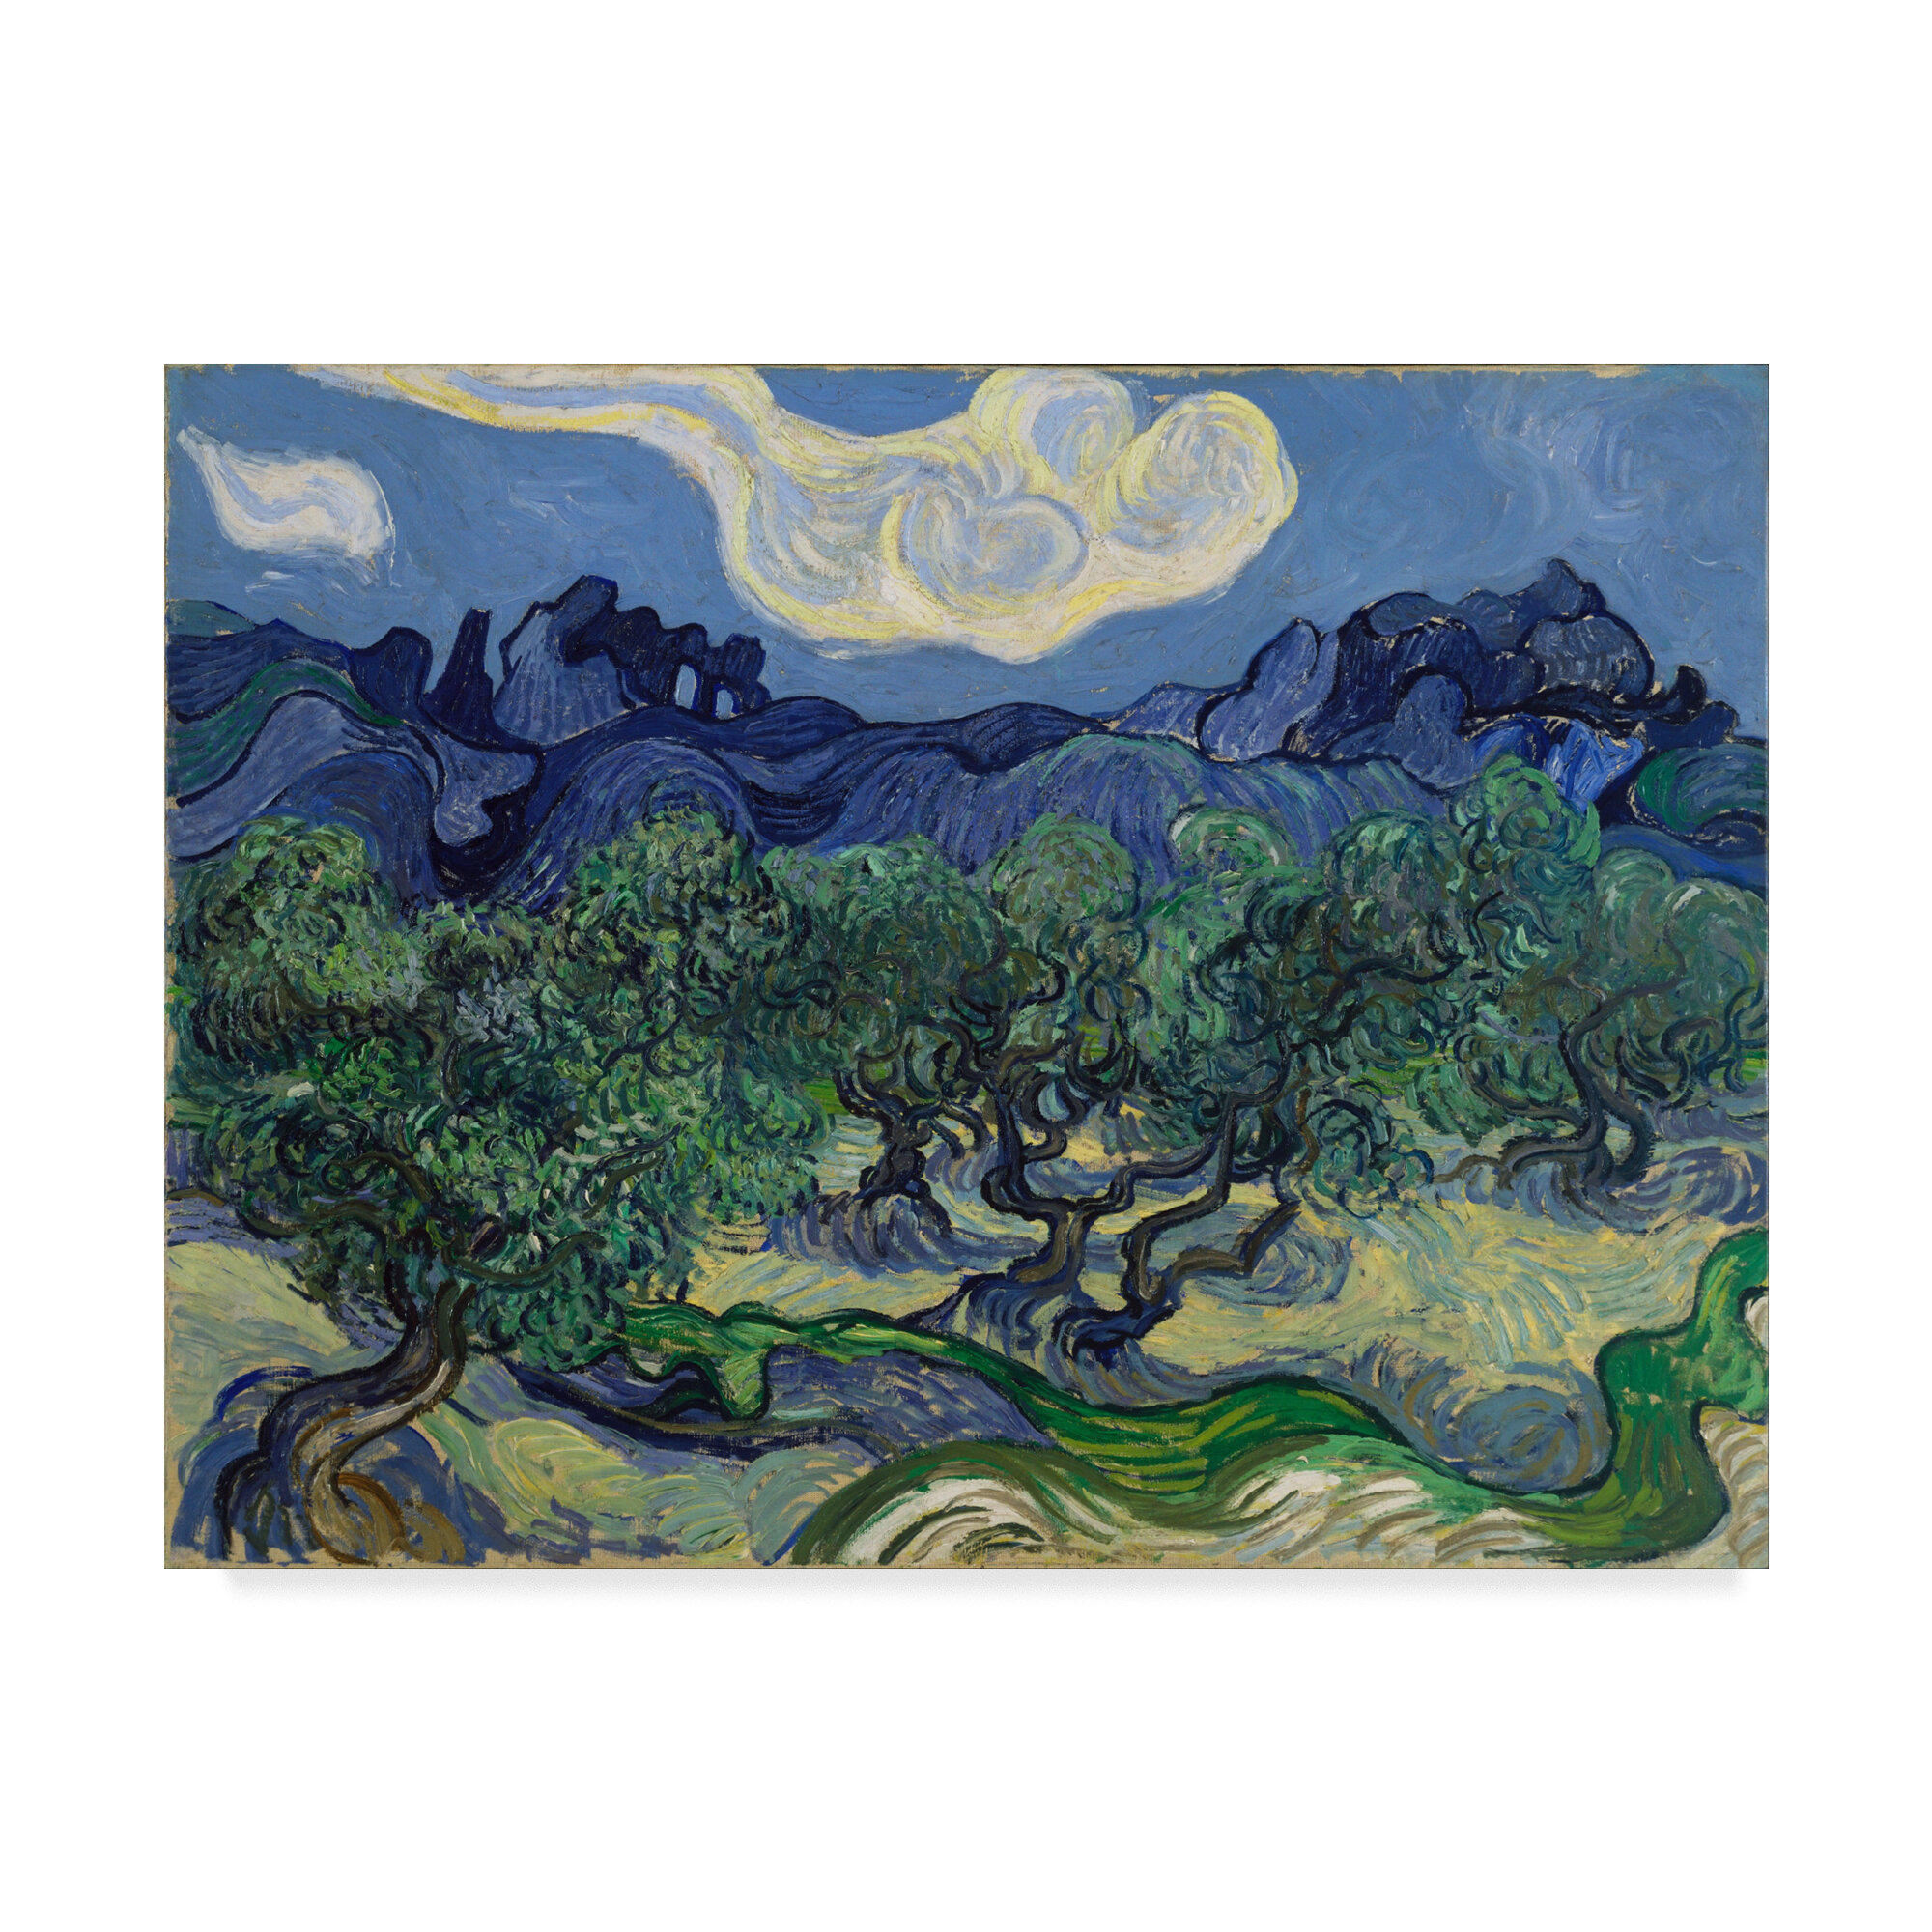 Les Alpilles a mountain landscape near Saint-Rémy by Van Gogh Giclee Repro